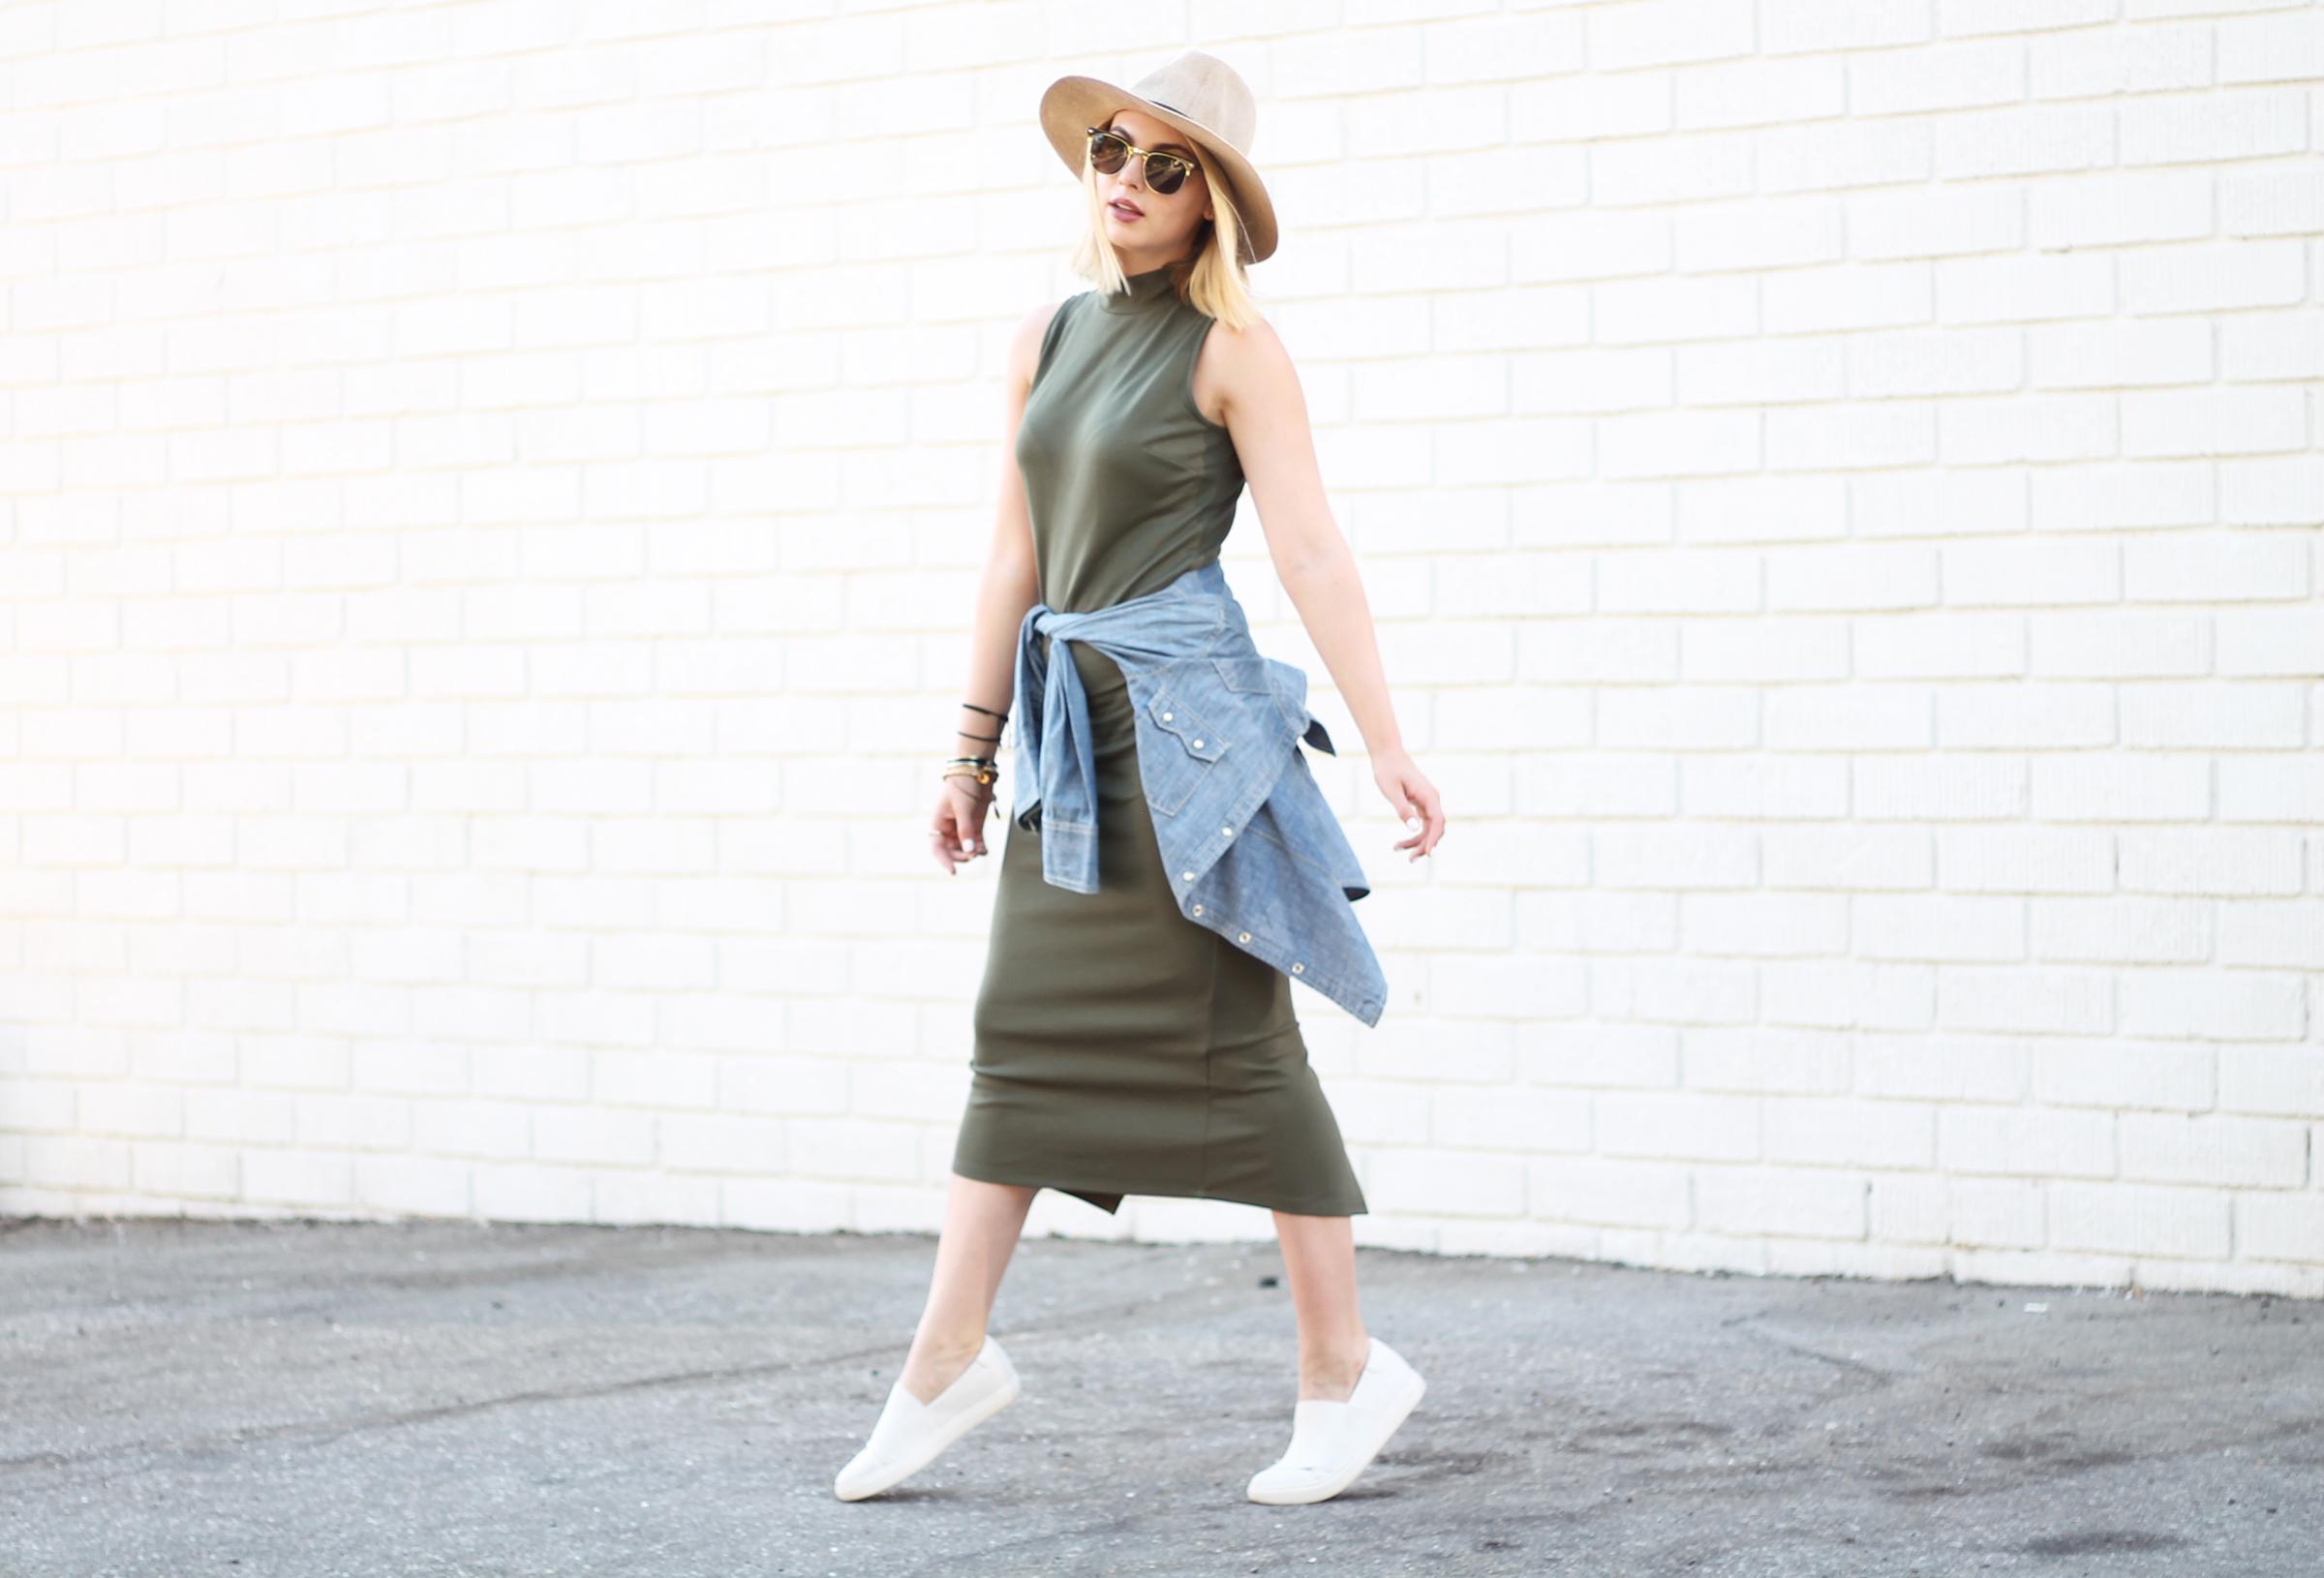 Midi Dress + Sneakers (Even